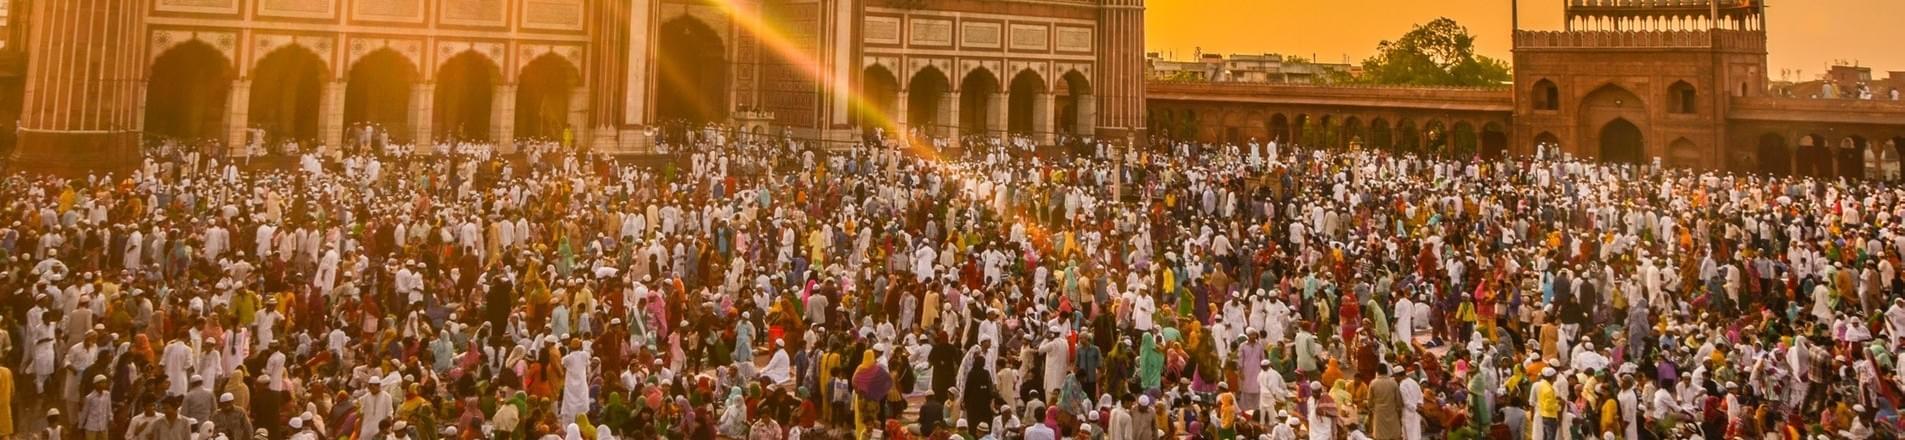 How to avoid indirect religious discrimination